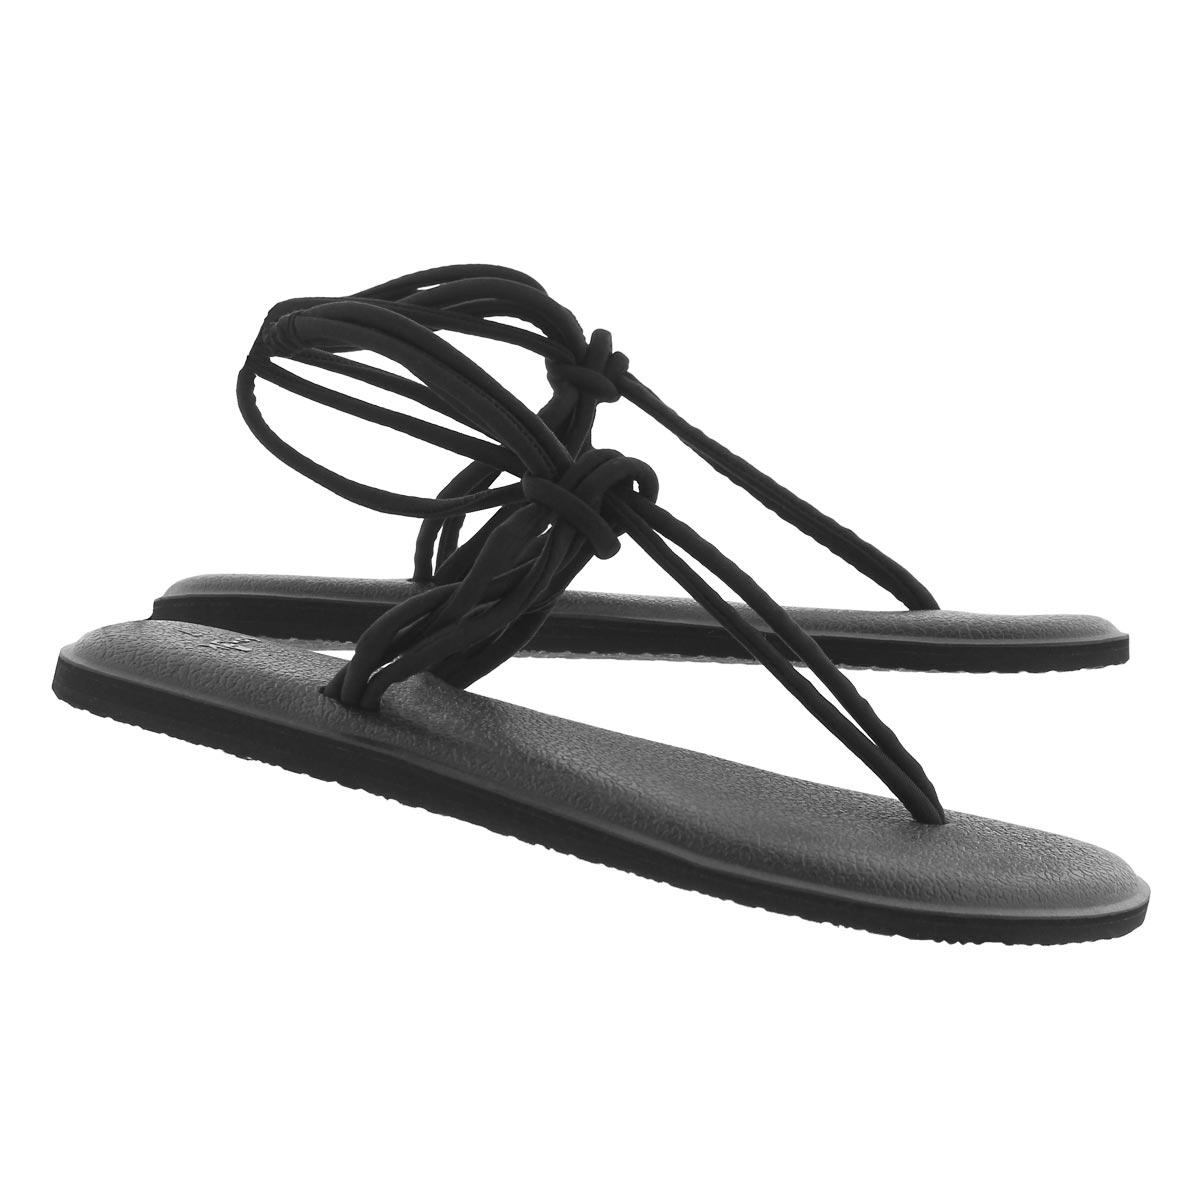 Lds Yoga Sunshine black thong sandal